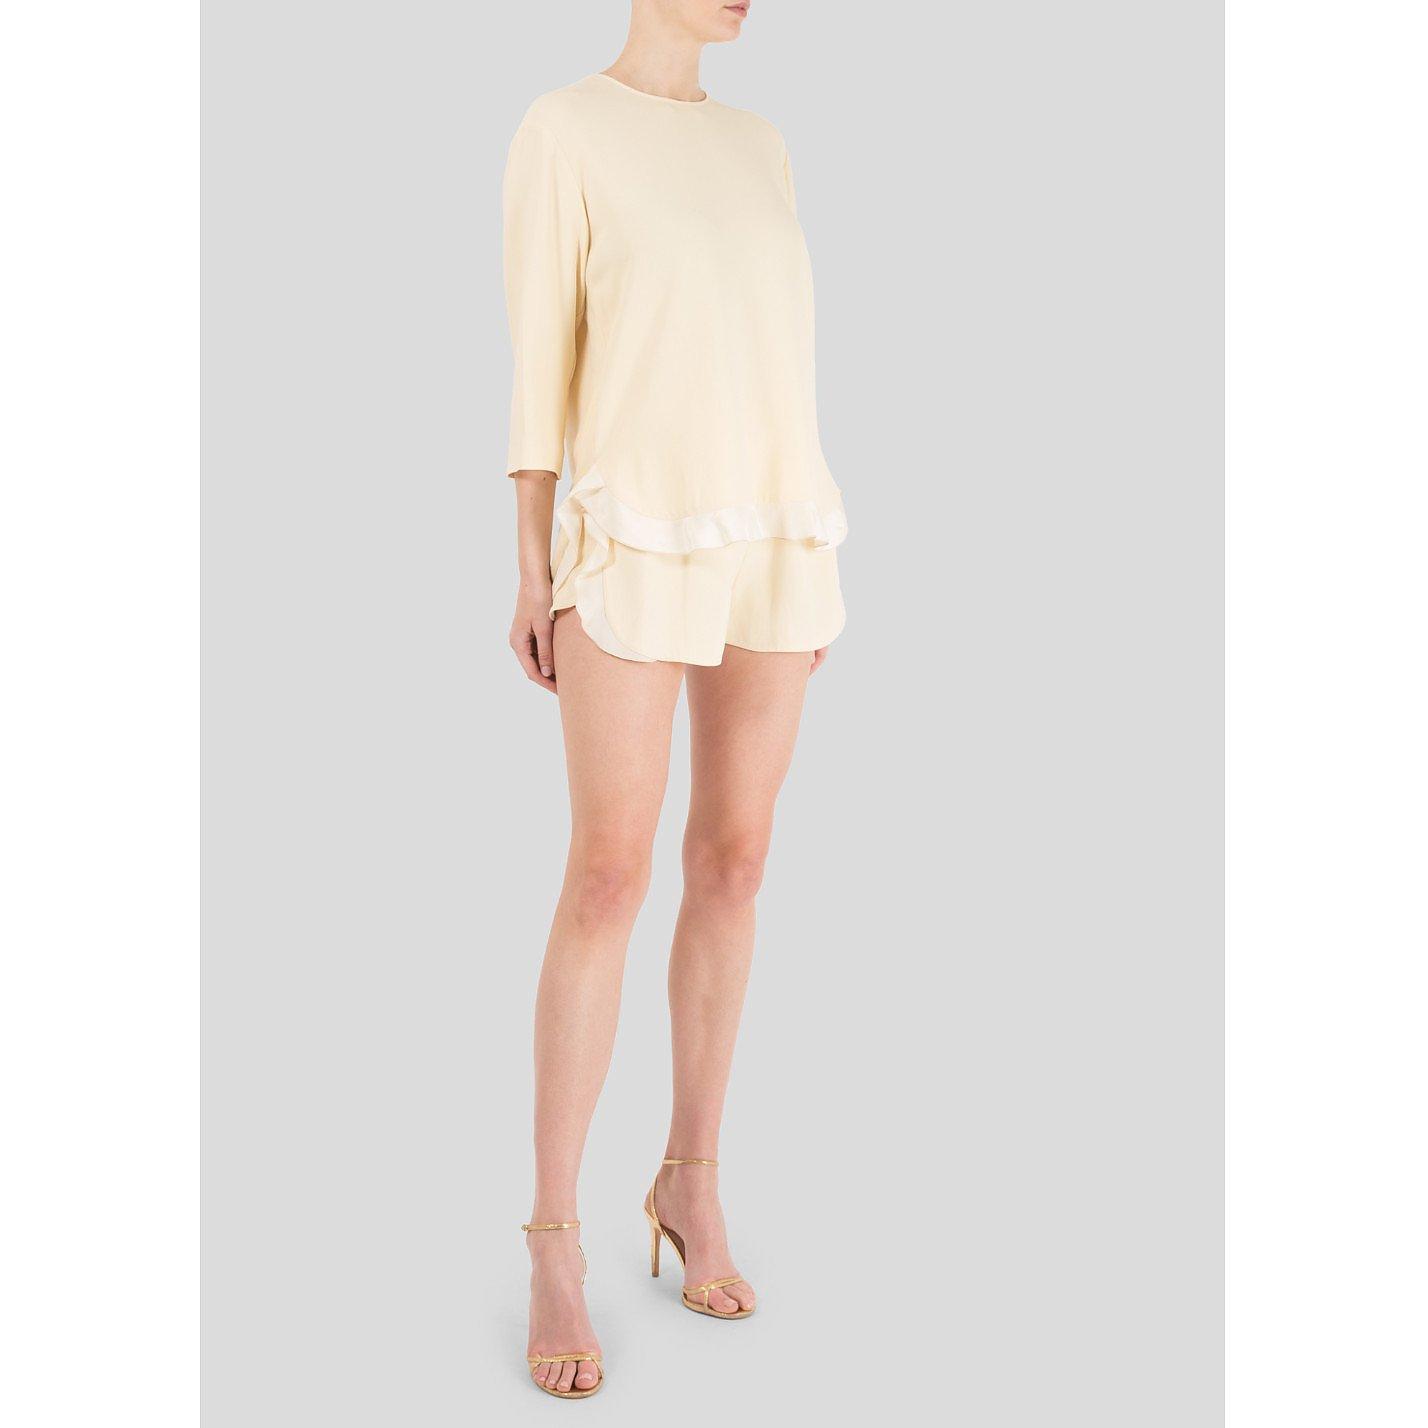 Stella McCartney Ruffle-Trimmed Top & Shorts